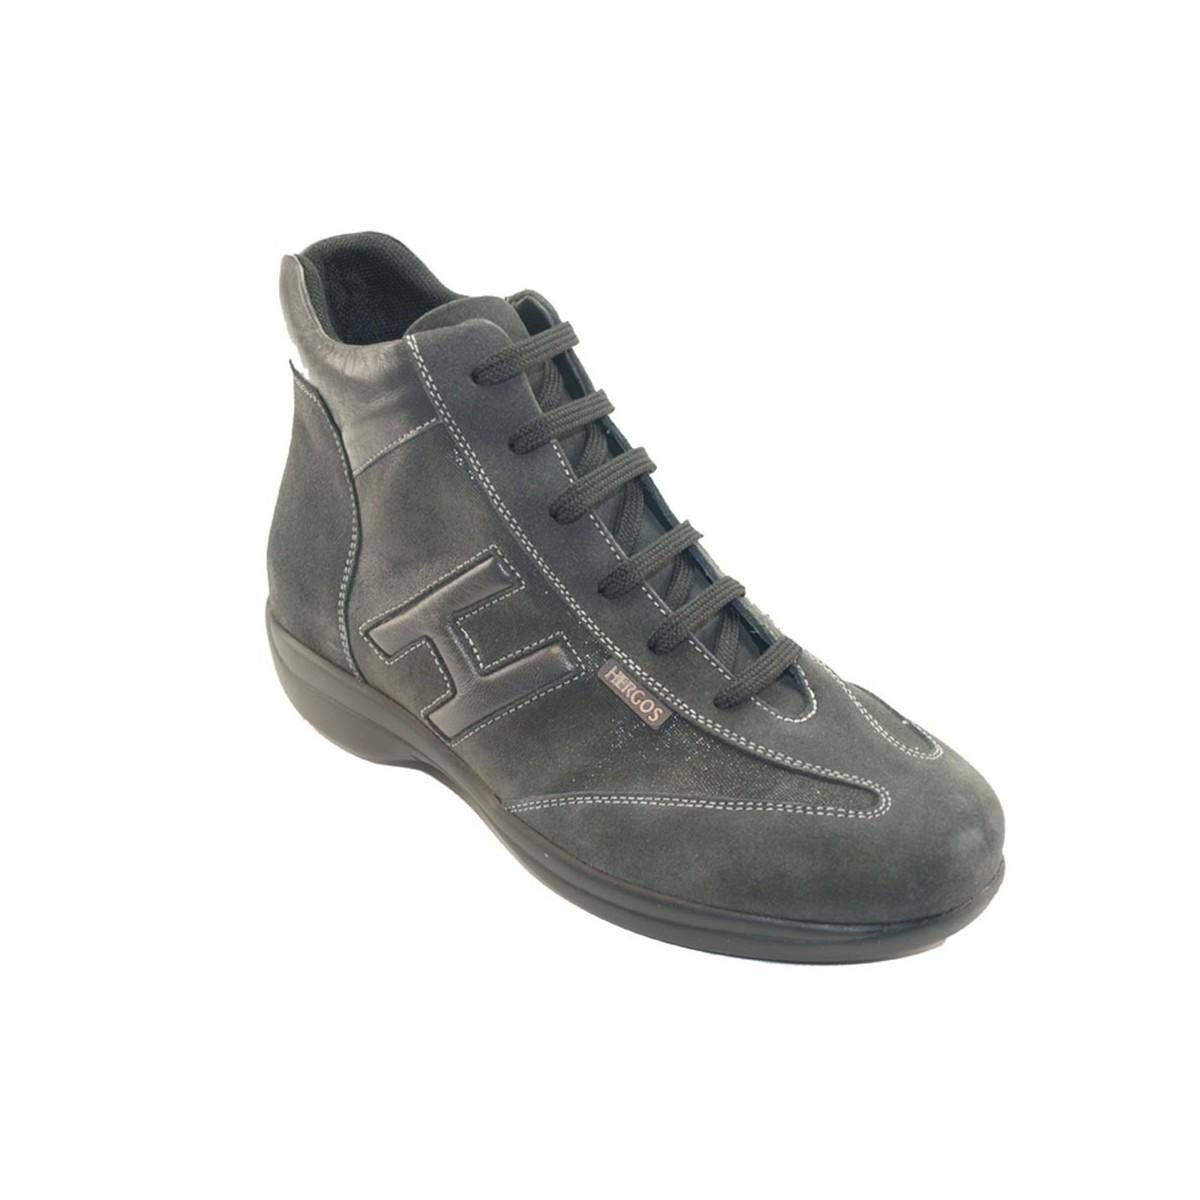 H 9102 Grigio - Scarpa comoda ed elegante, vera pelle e camoscio